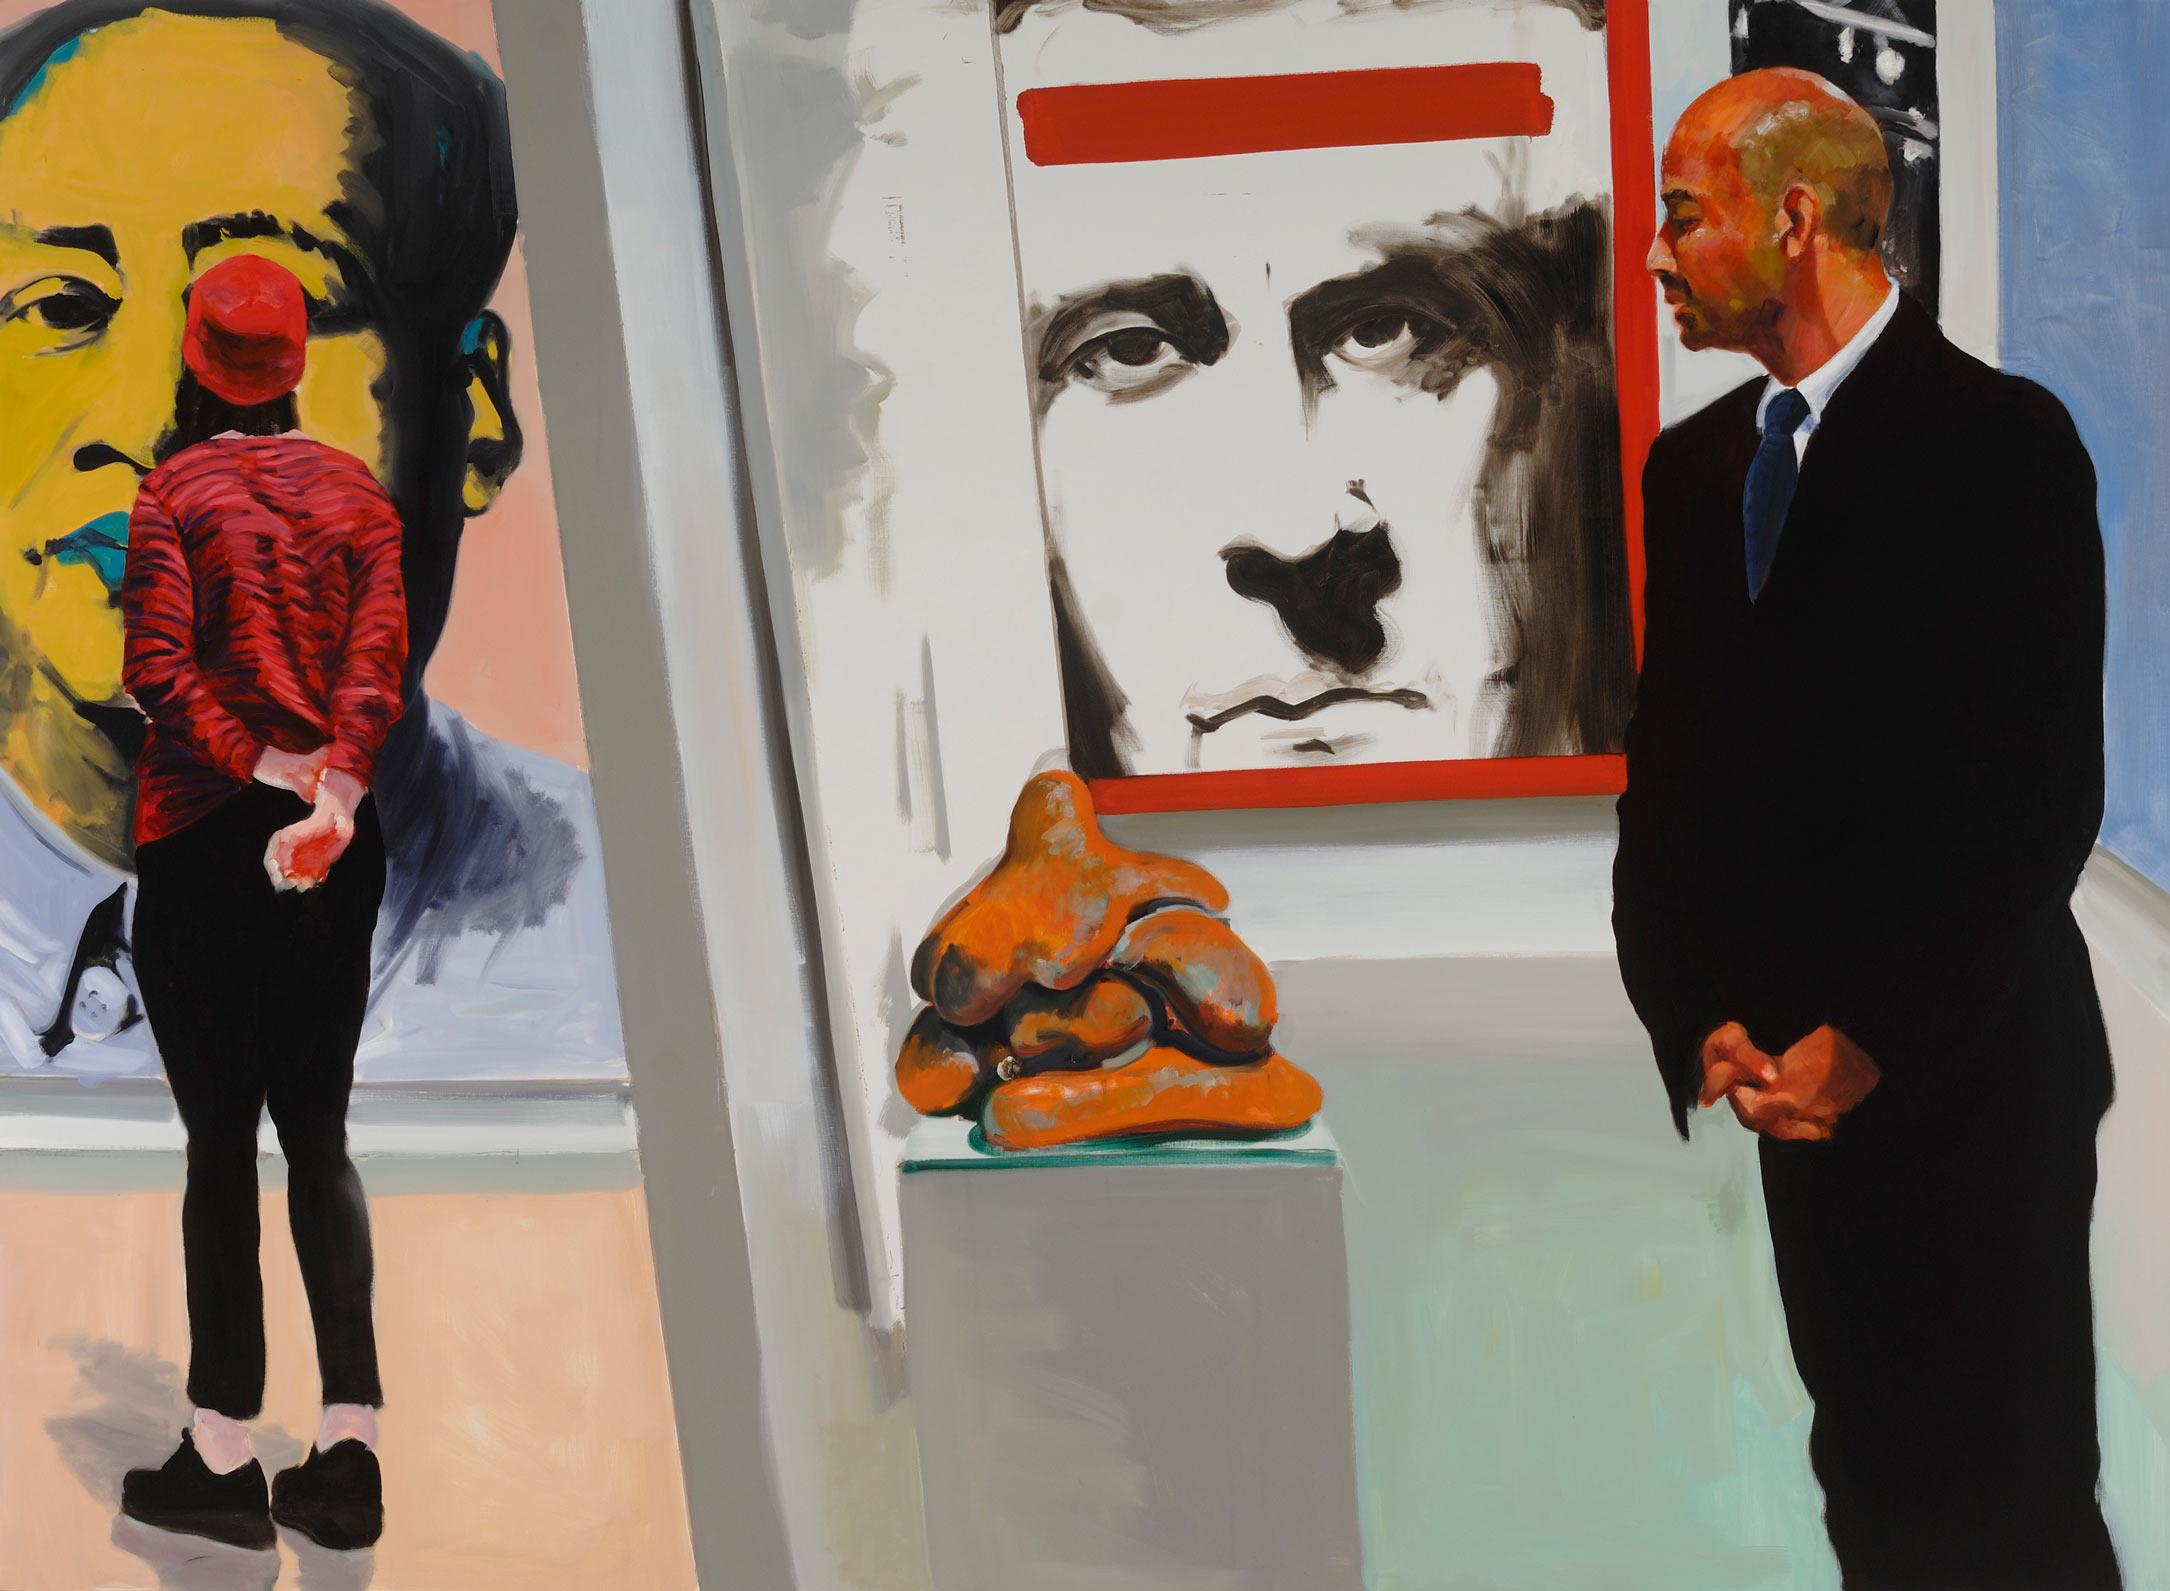 Art Fair: Booth #16 Sexual Politics, 2014. Oil on Linen. 82 x 112 in. (208 x 284 cm.)